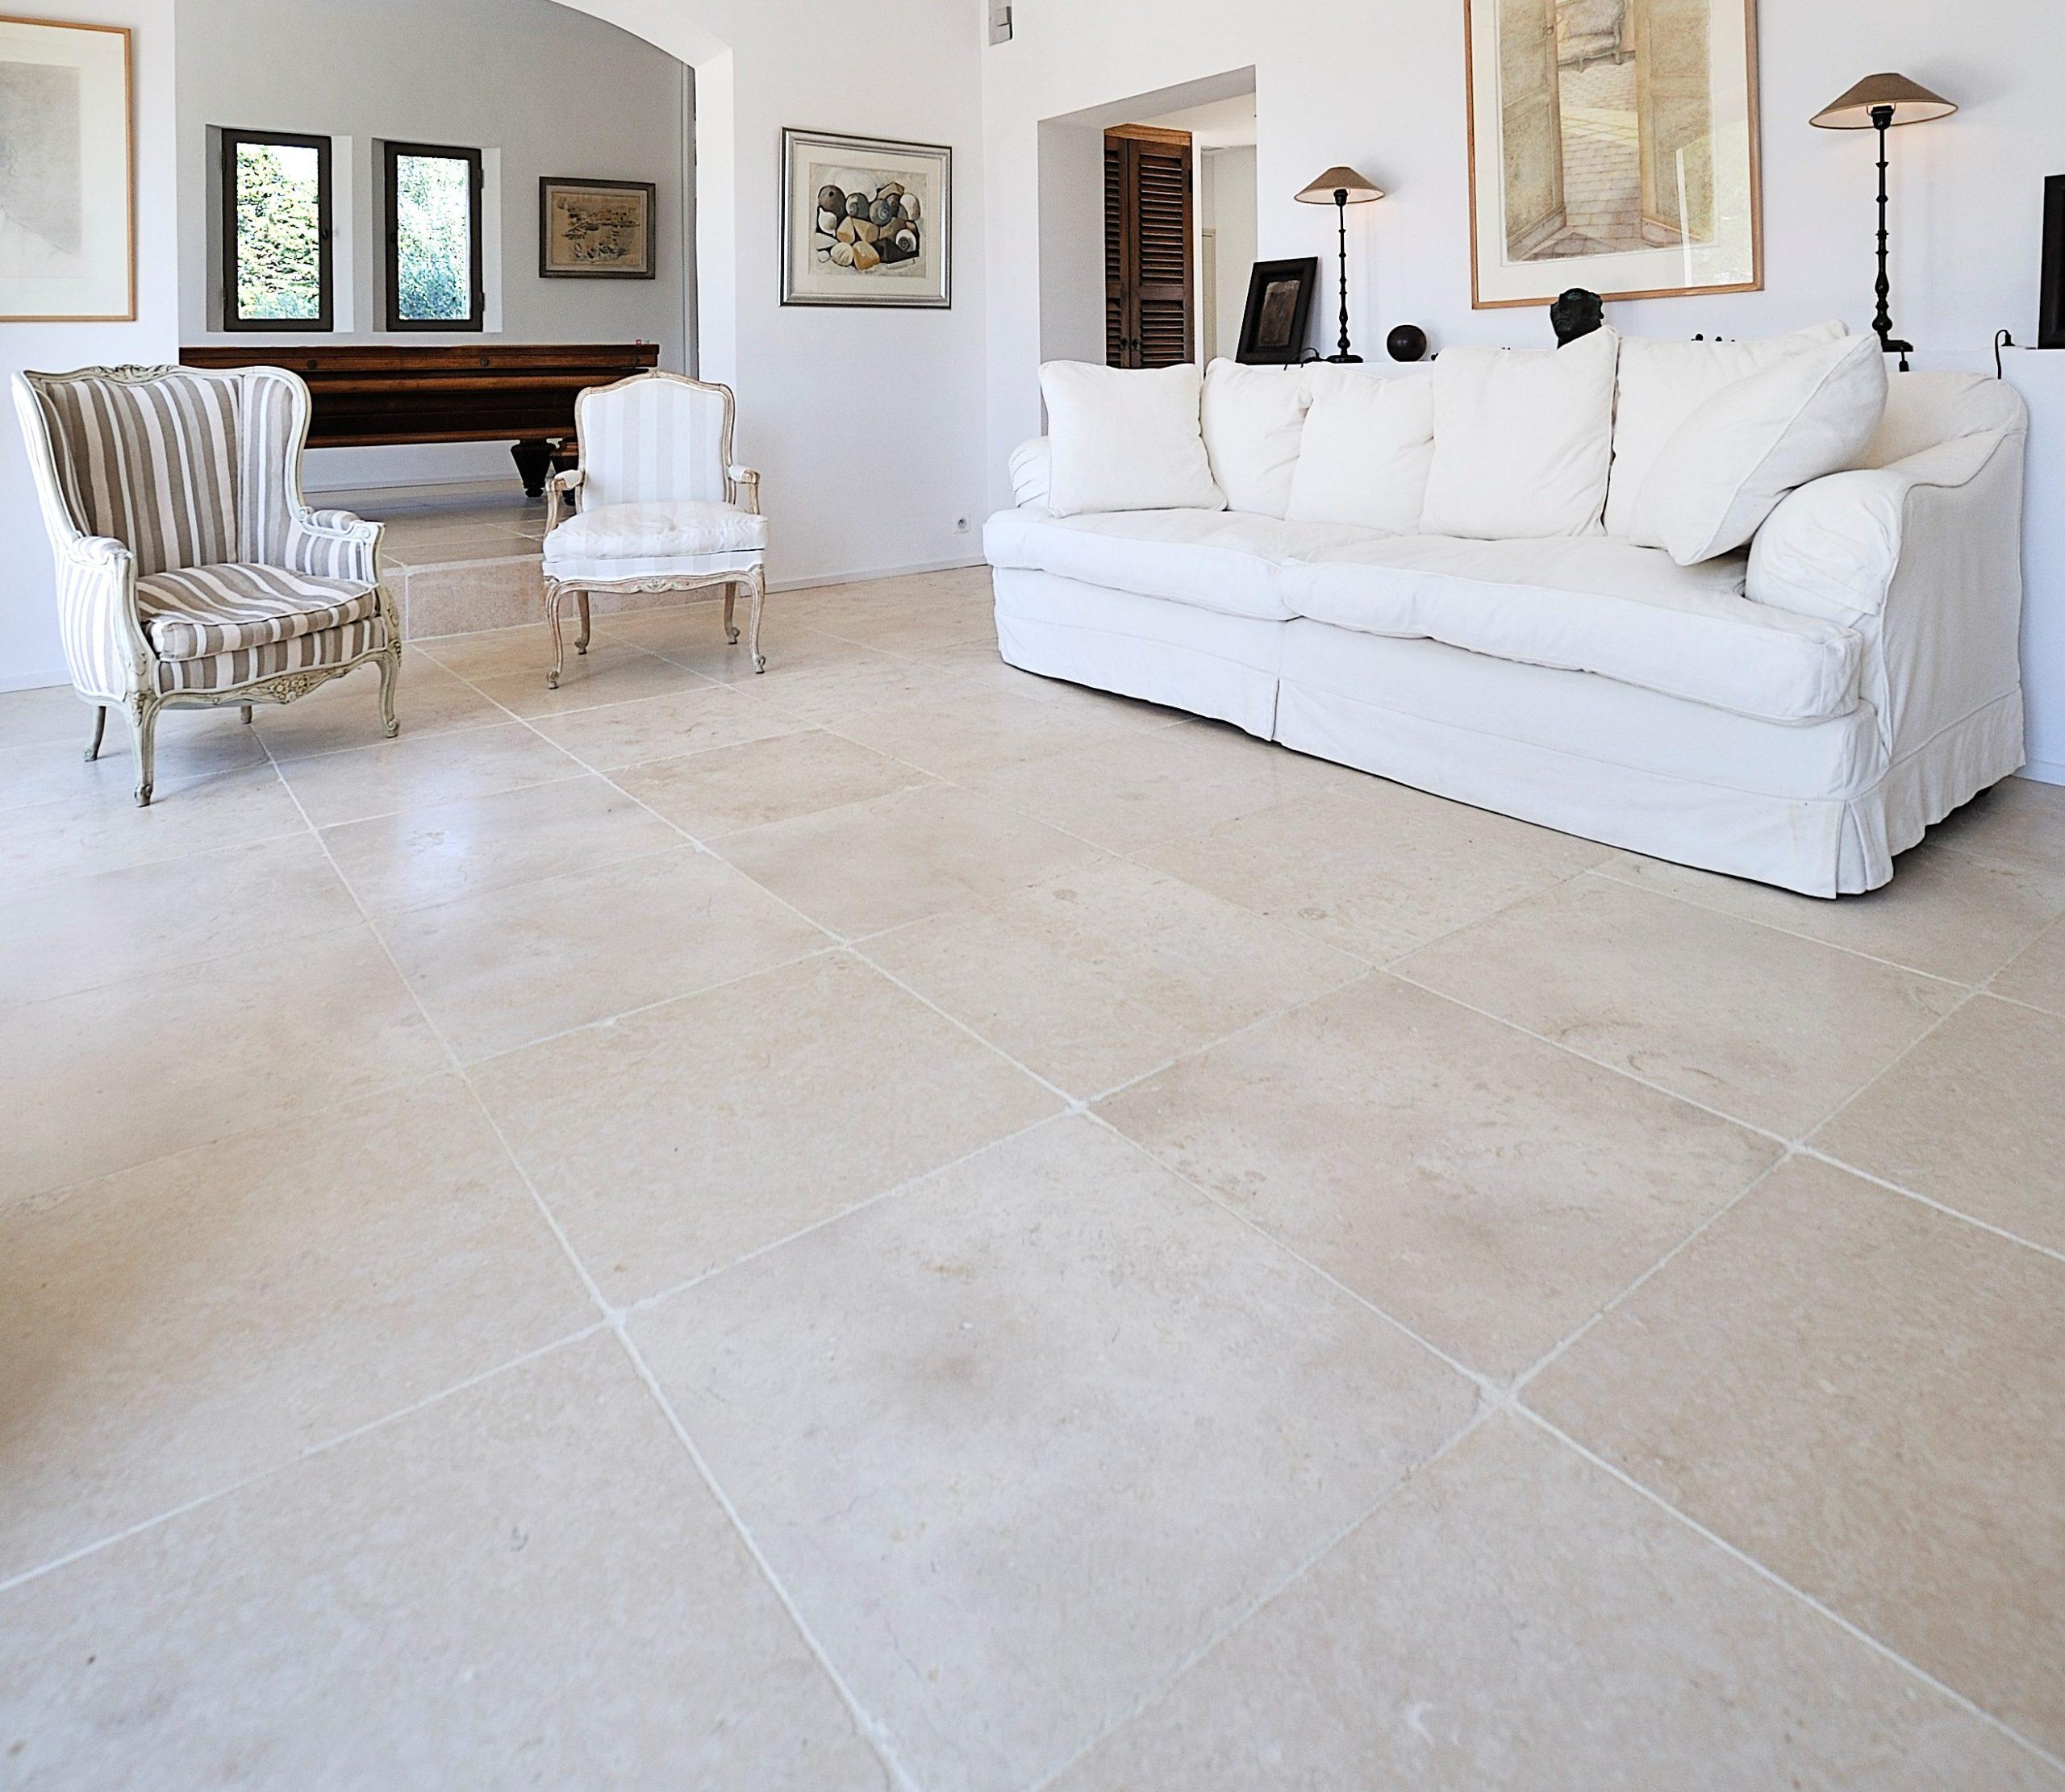 40.6x61x1.2 Royal Bianco Vieilli